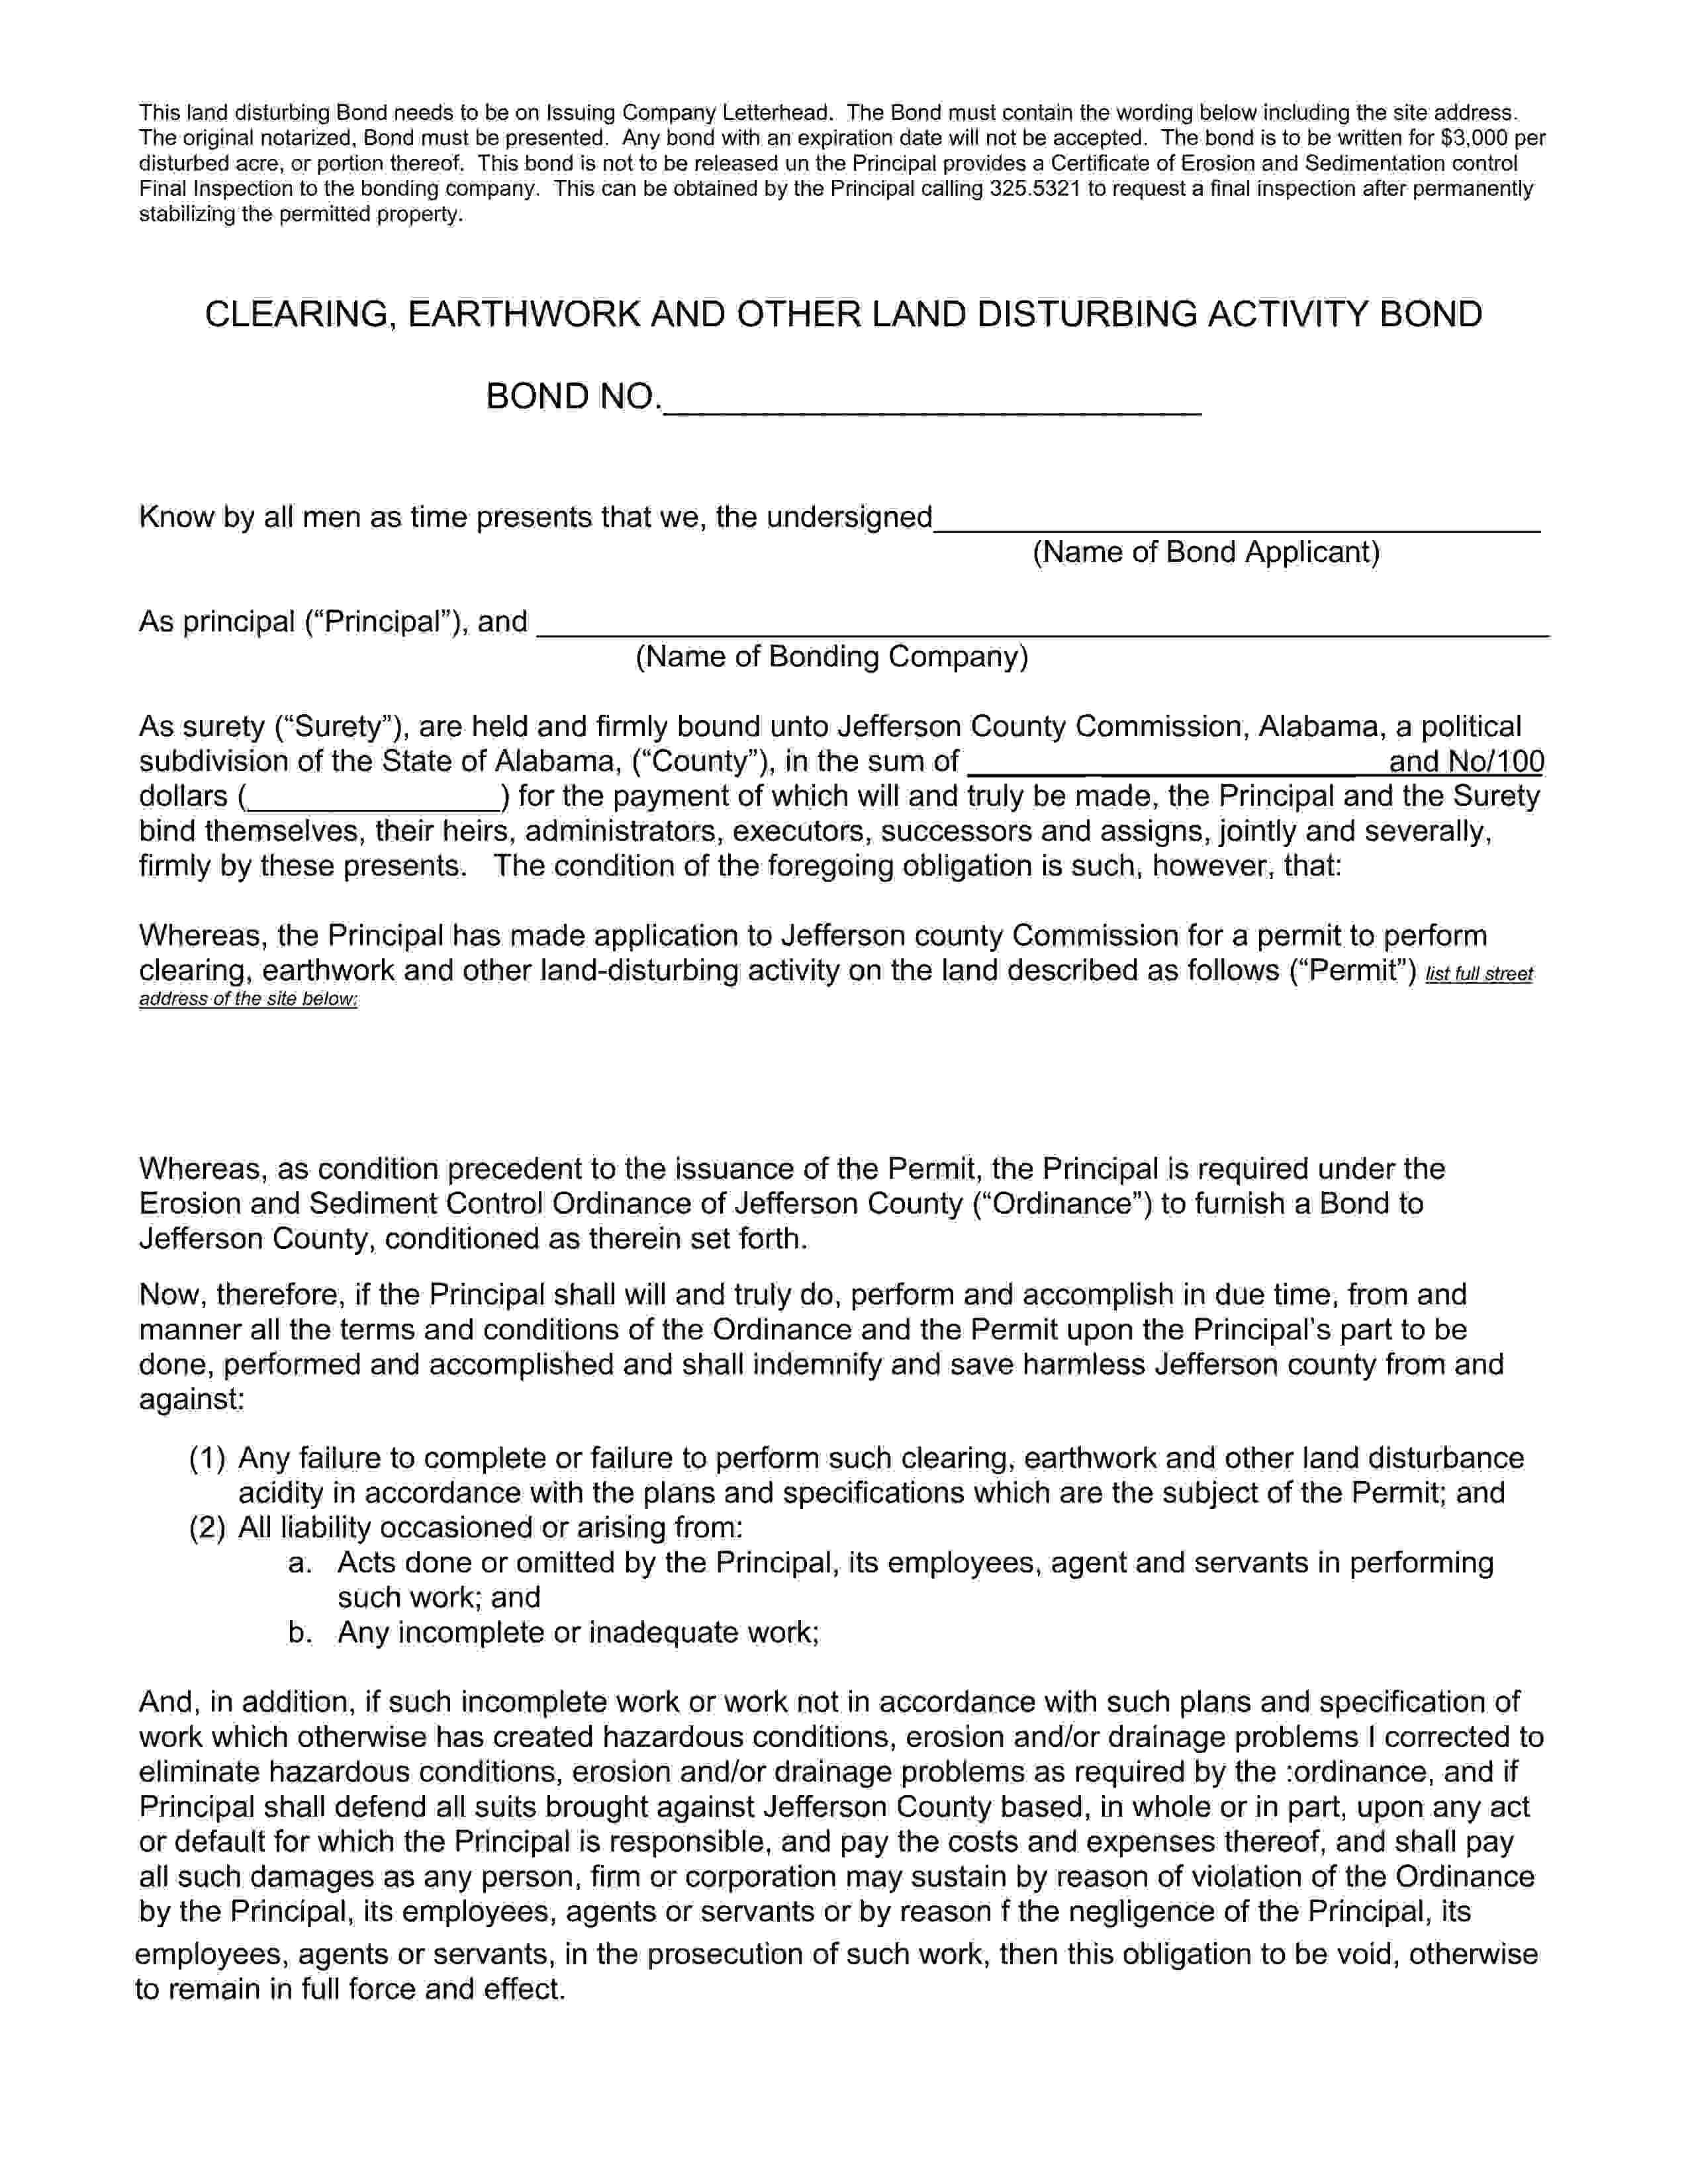 Jefferson County Commission Jefferson - County Land Disturbing Bond sample image